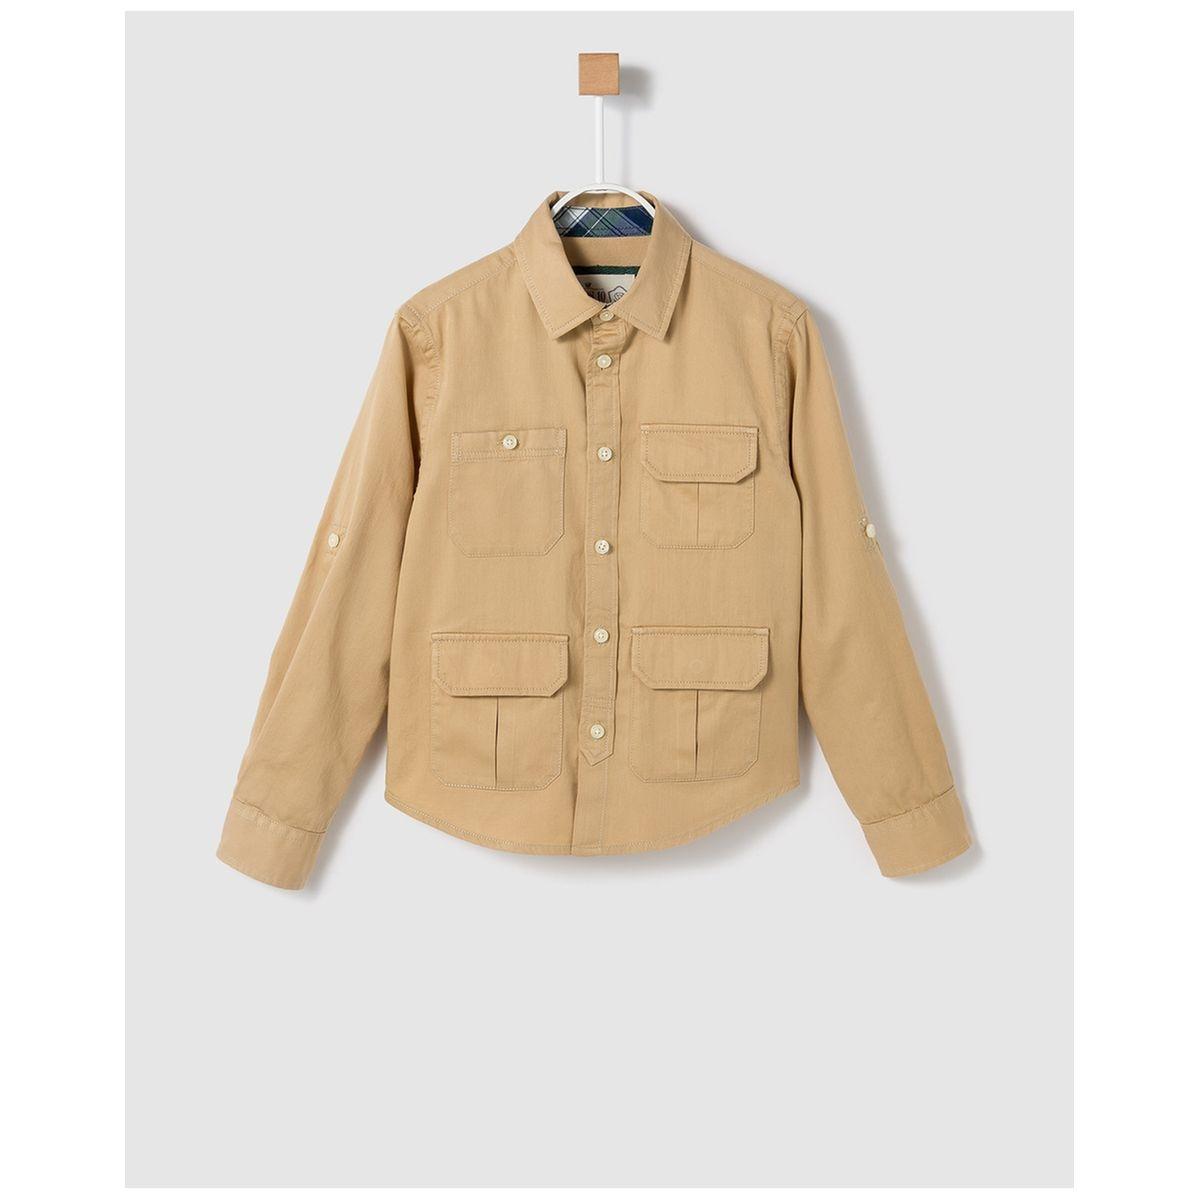 Chemise à poches multiples